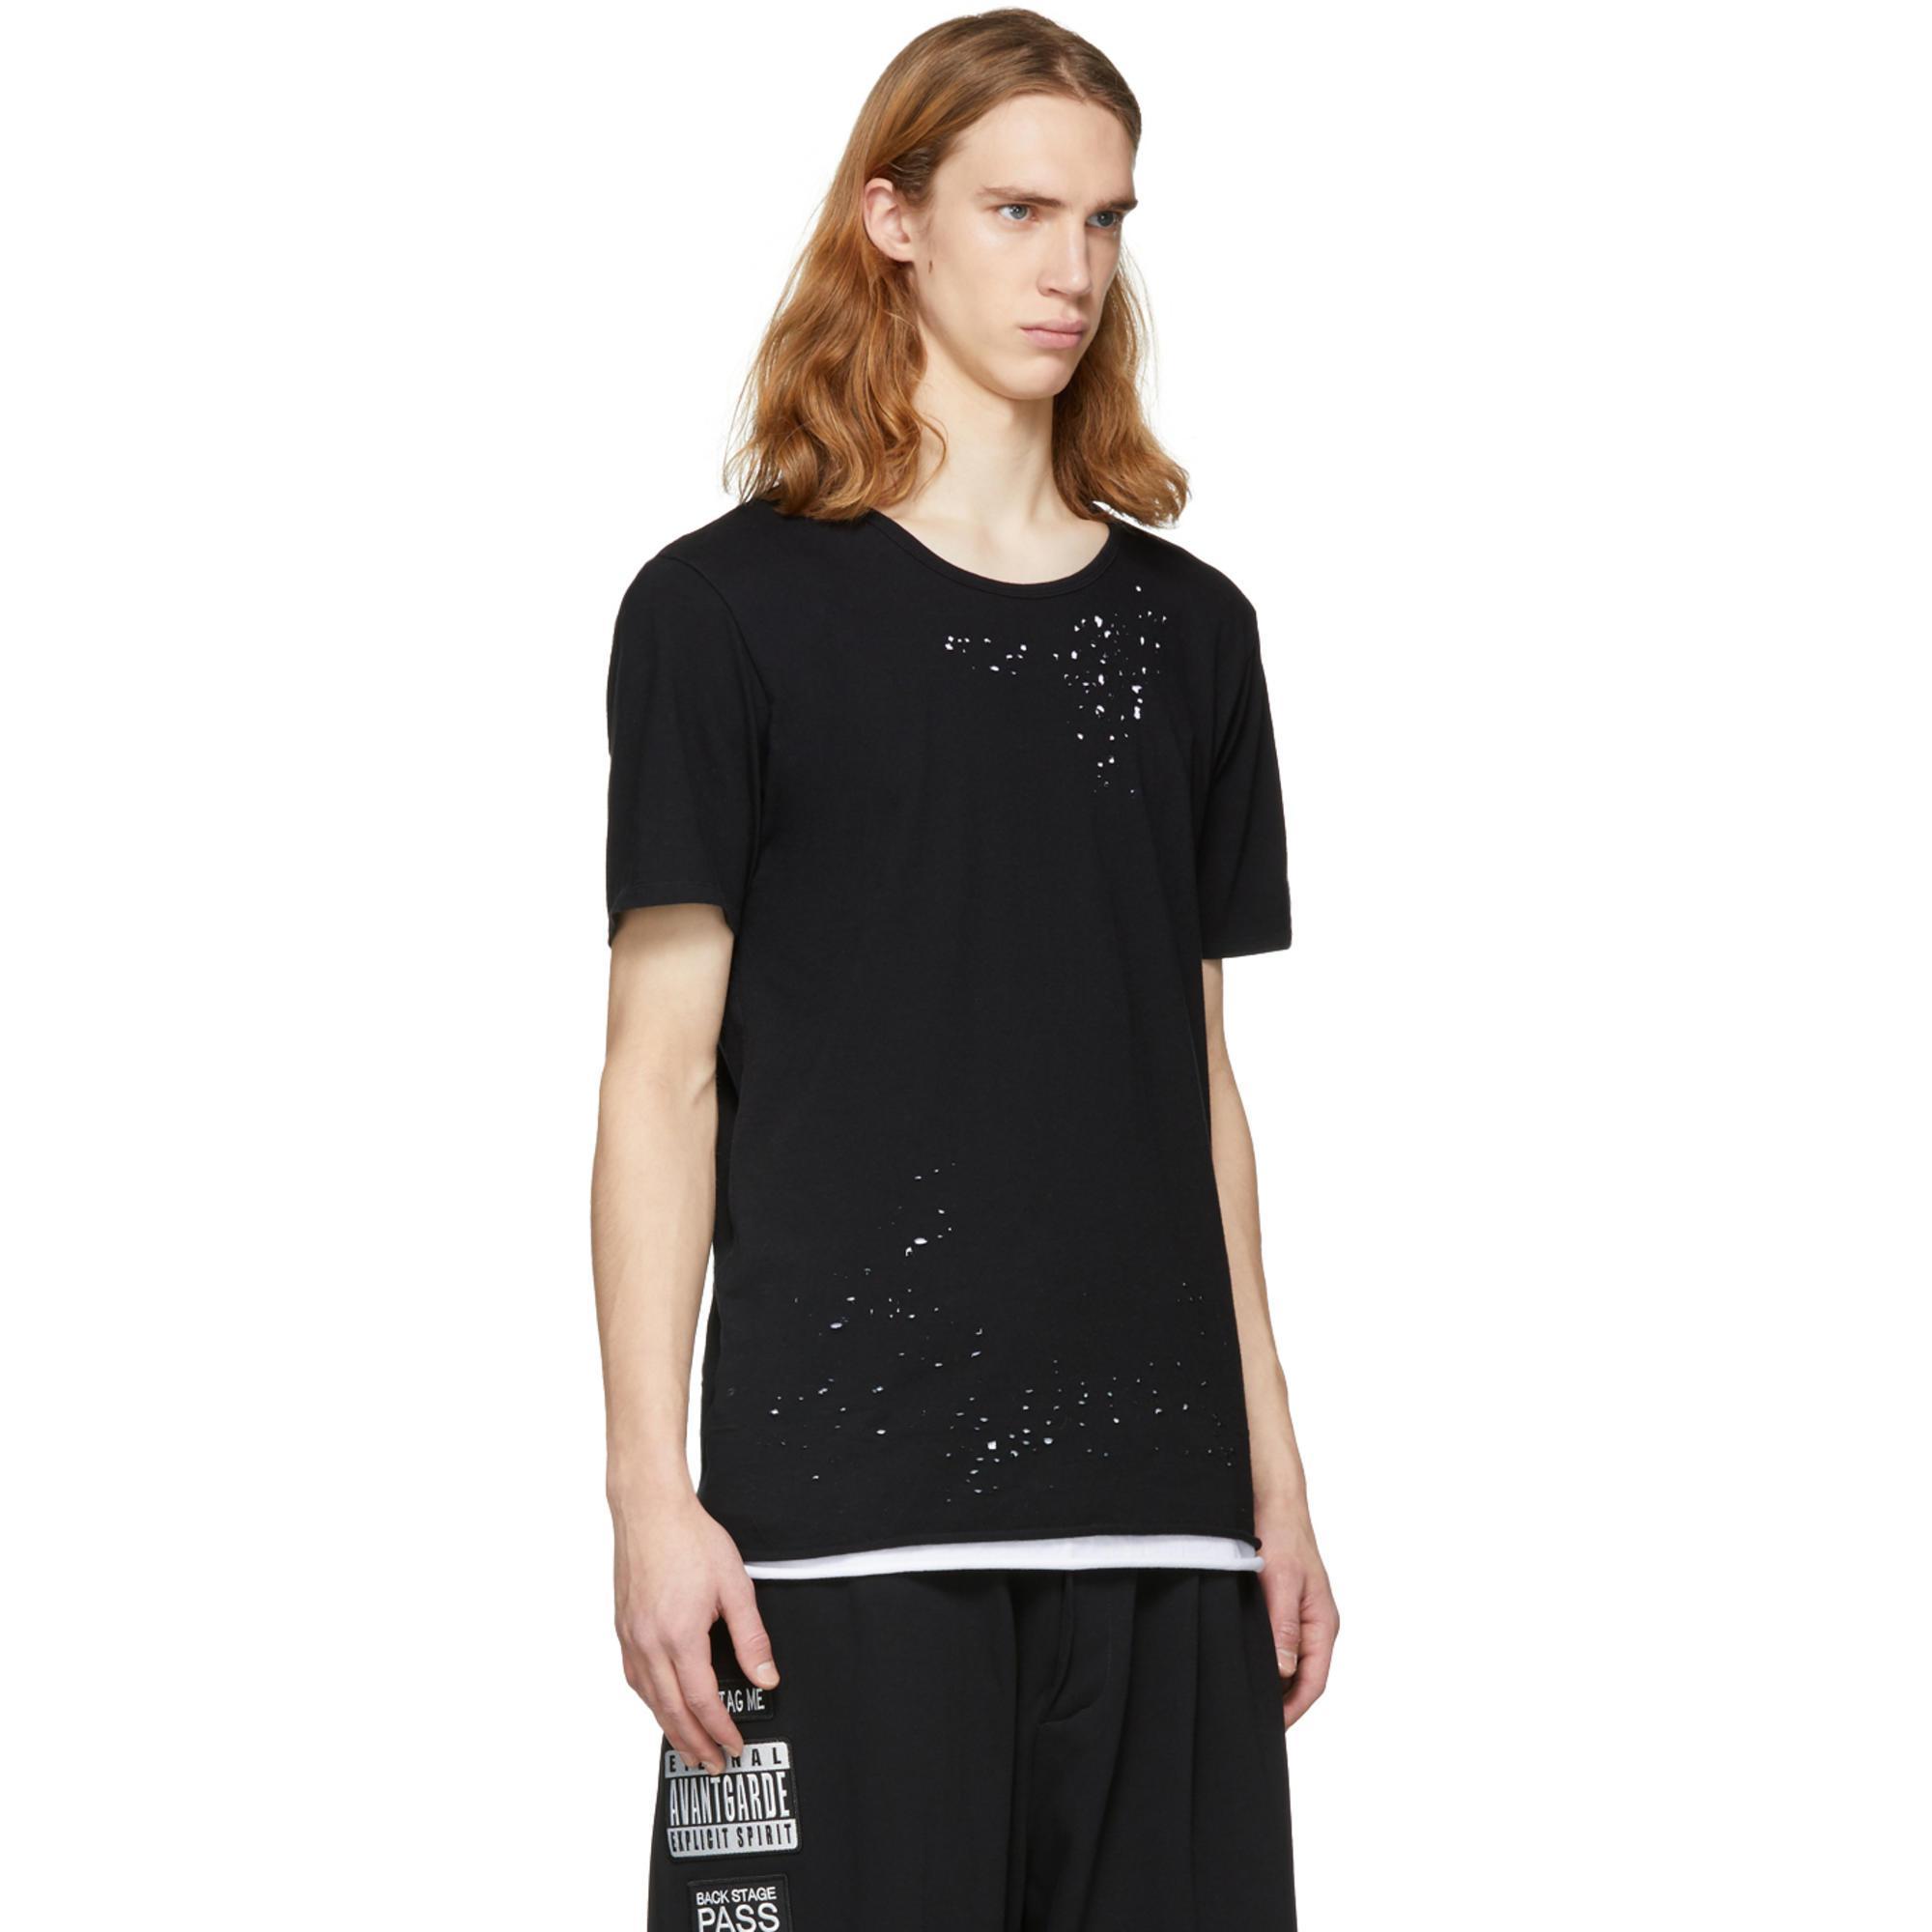 Black and White Striped Damaged Layer T-Shirt Miharayasuhiro Find Great t0ciIlvJZM